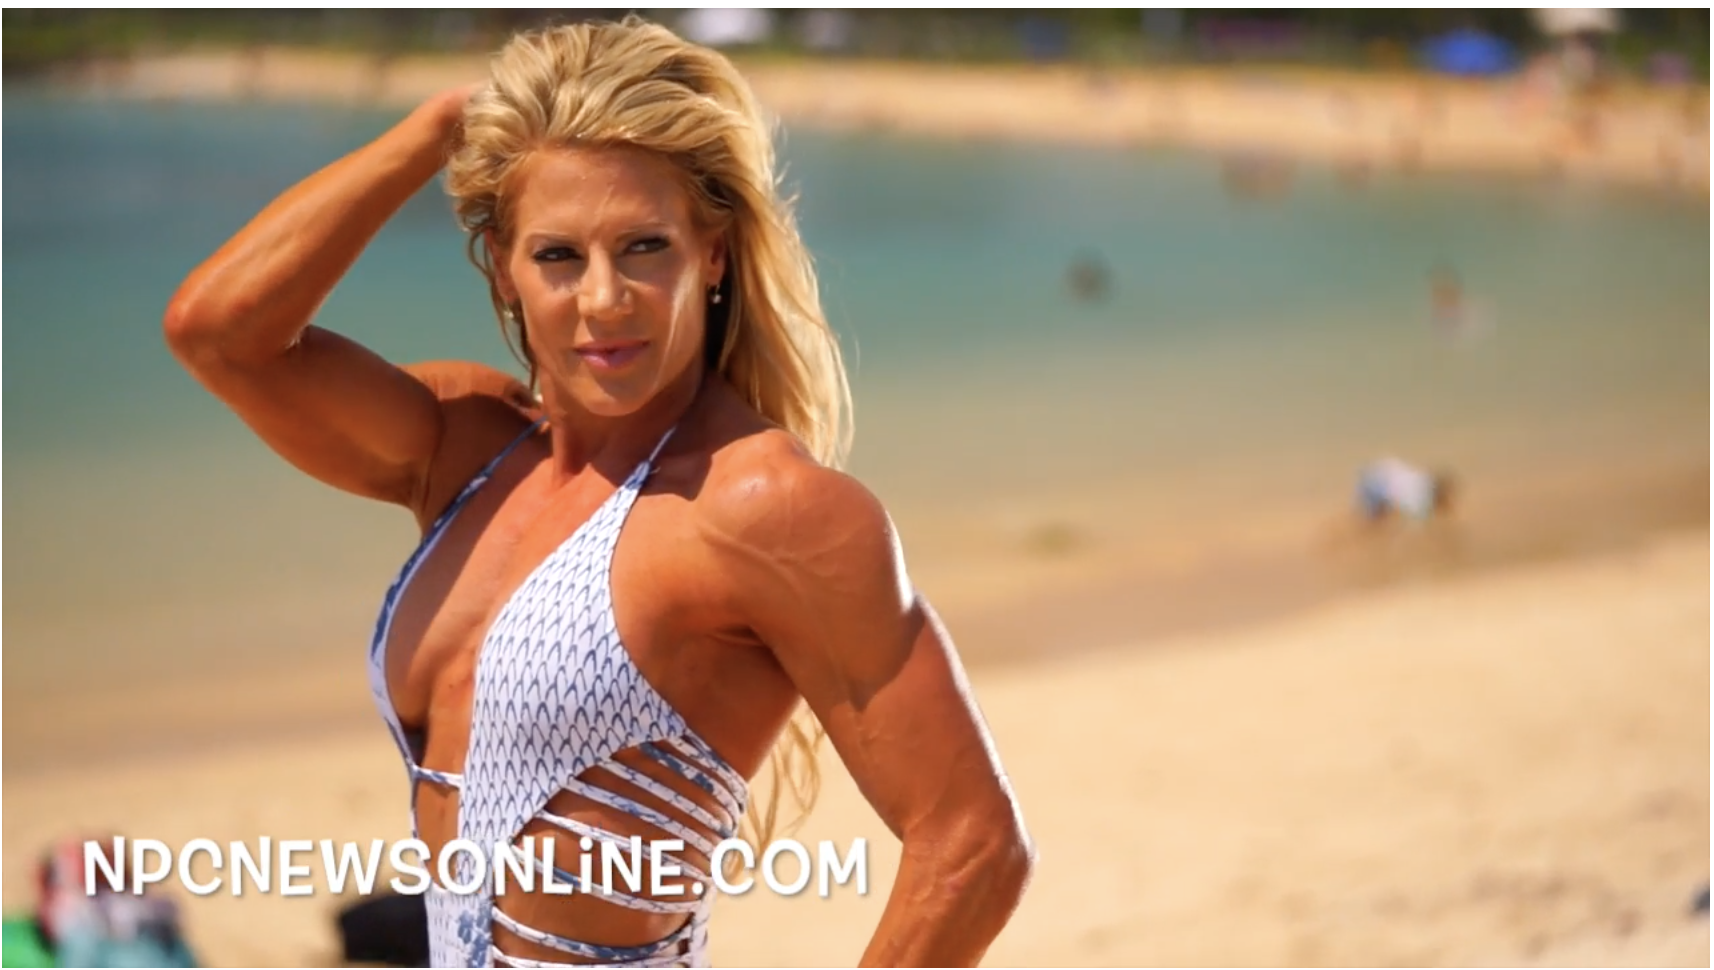 2017 J.M. Manion Hawaii Shoot: IFBB Fitness Pro Whitney Jones Behind The Scenes Video